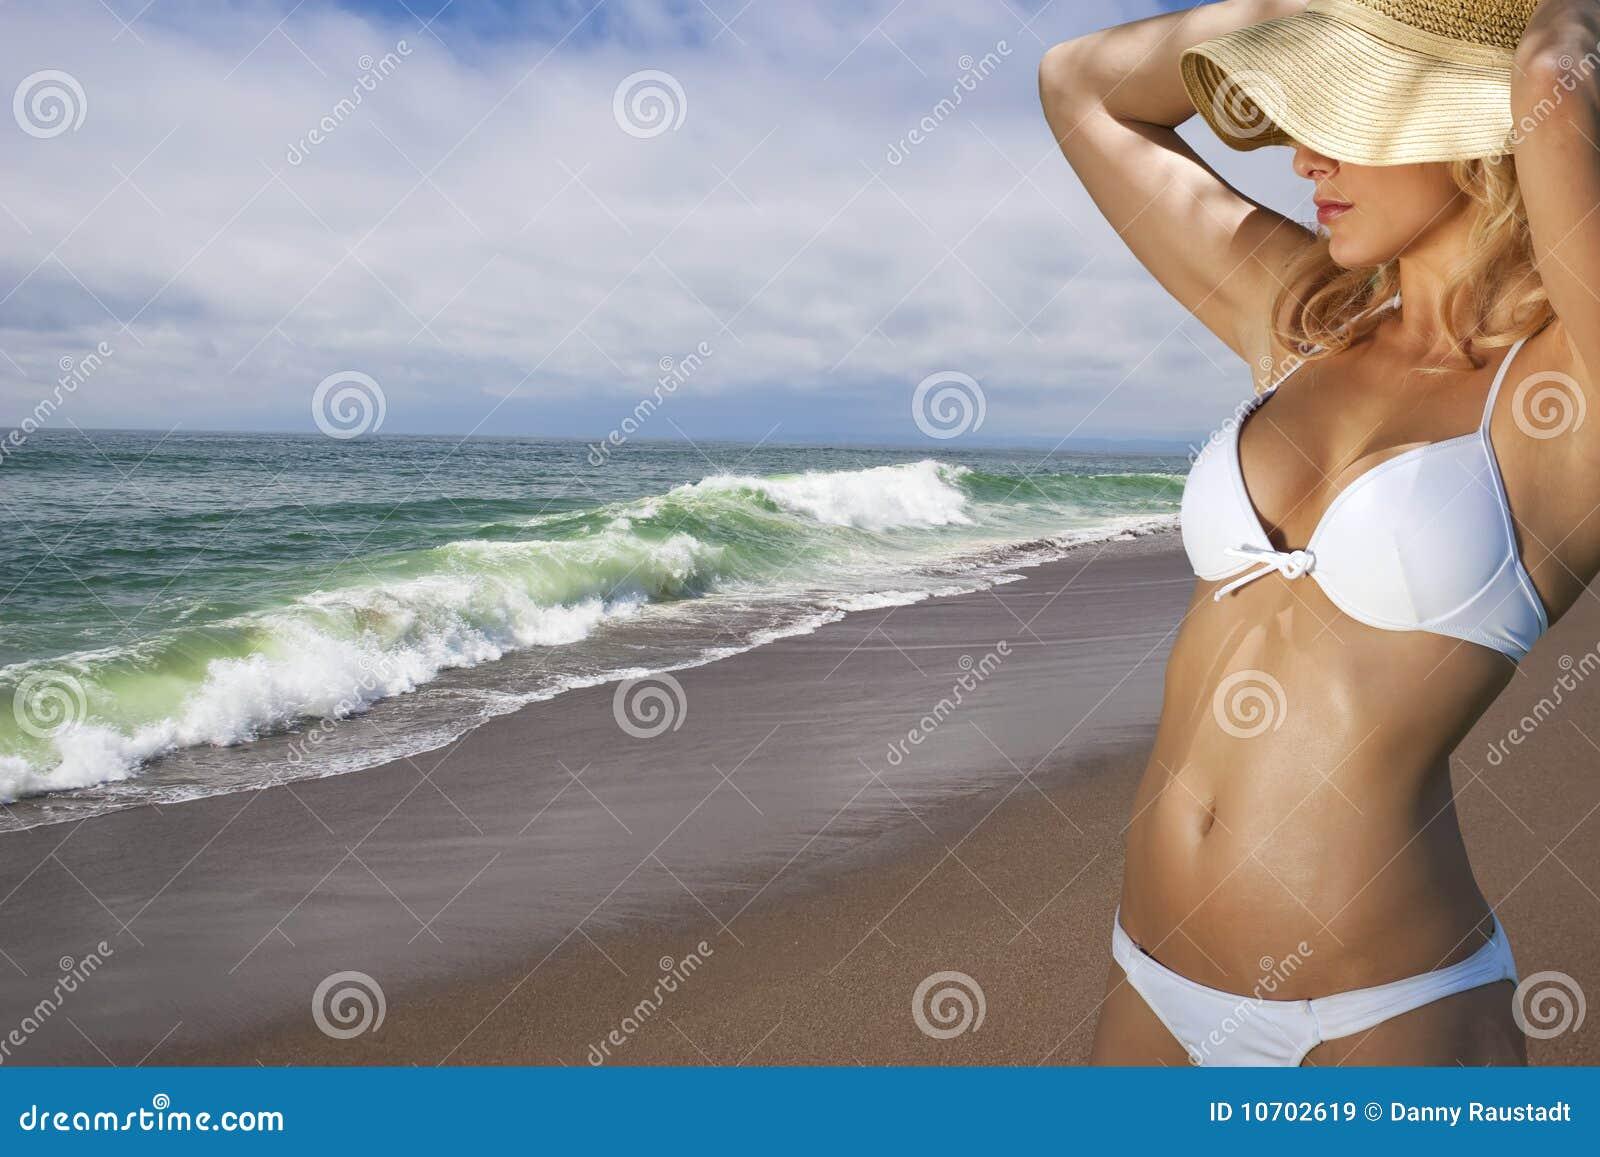 Junge blonde Frau, die am Strand vacationing ist